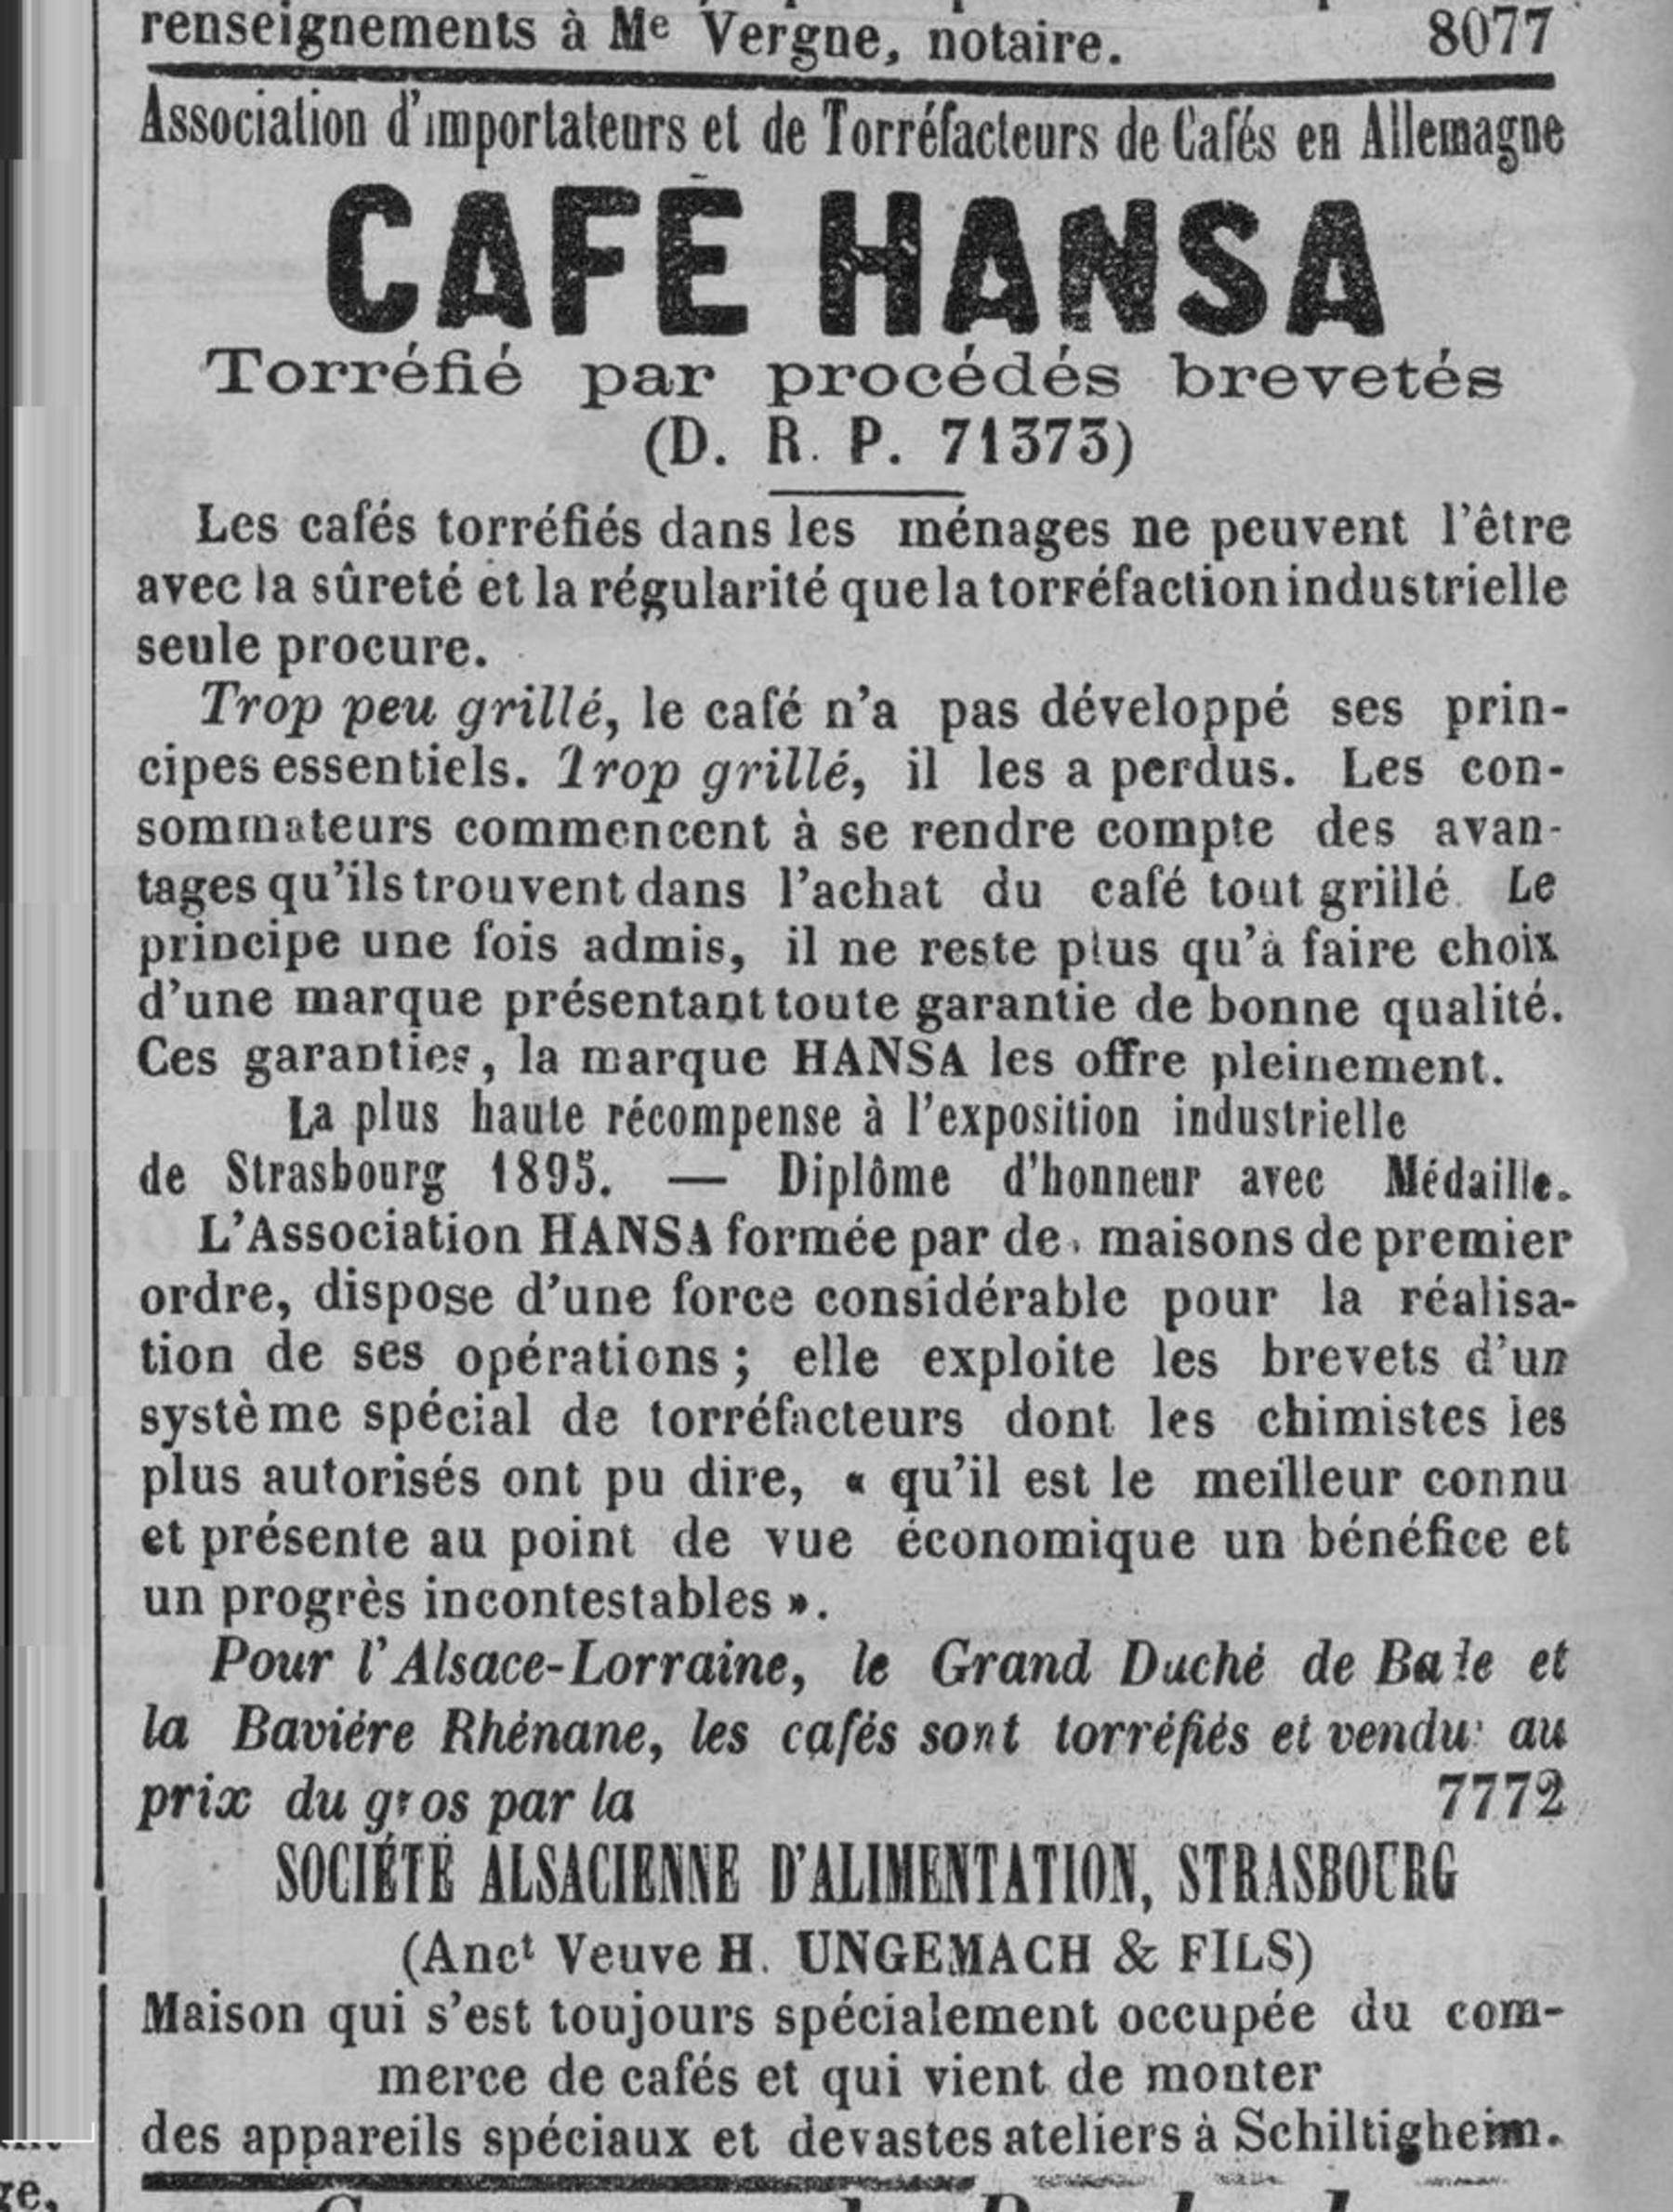 Contenu du Café Hansa